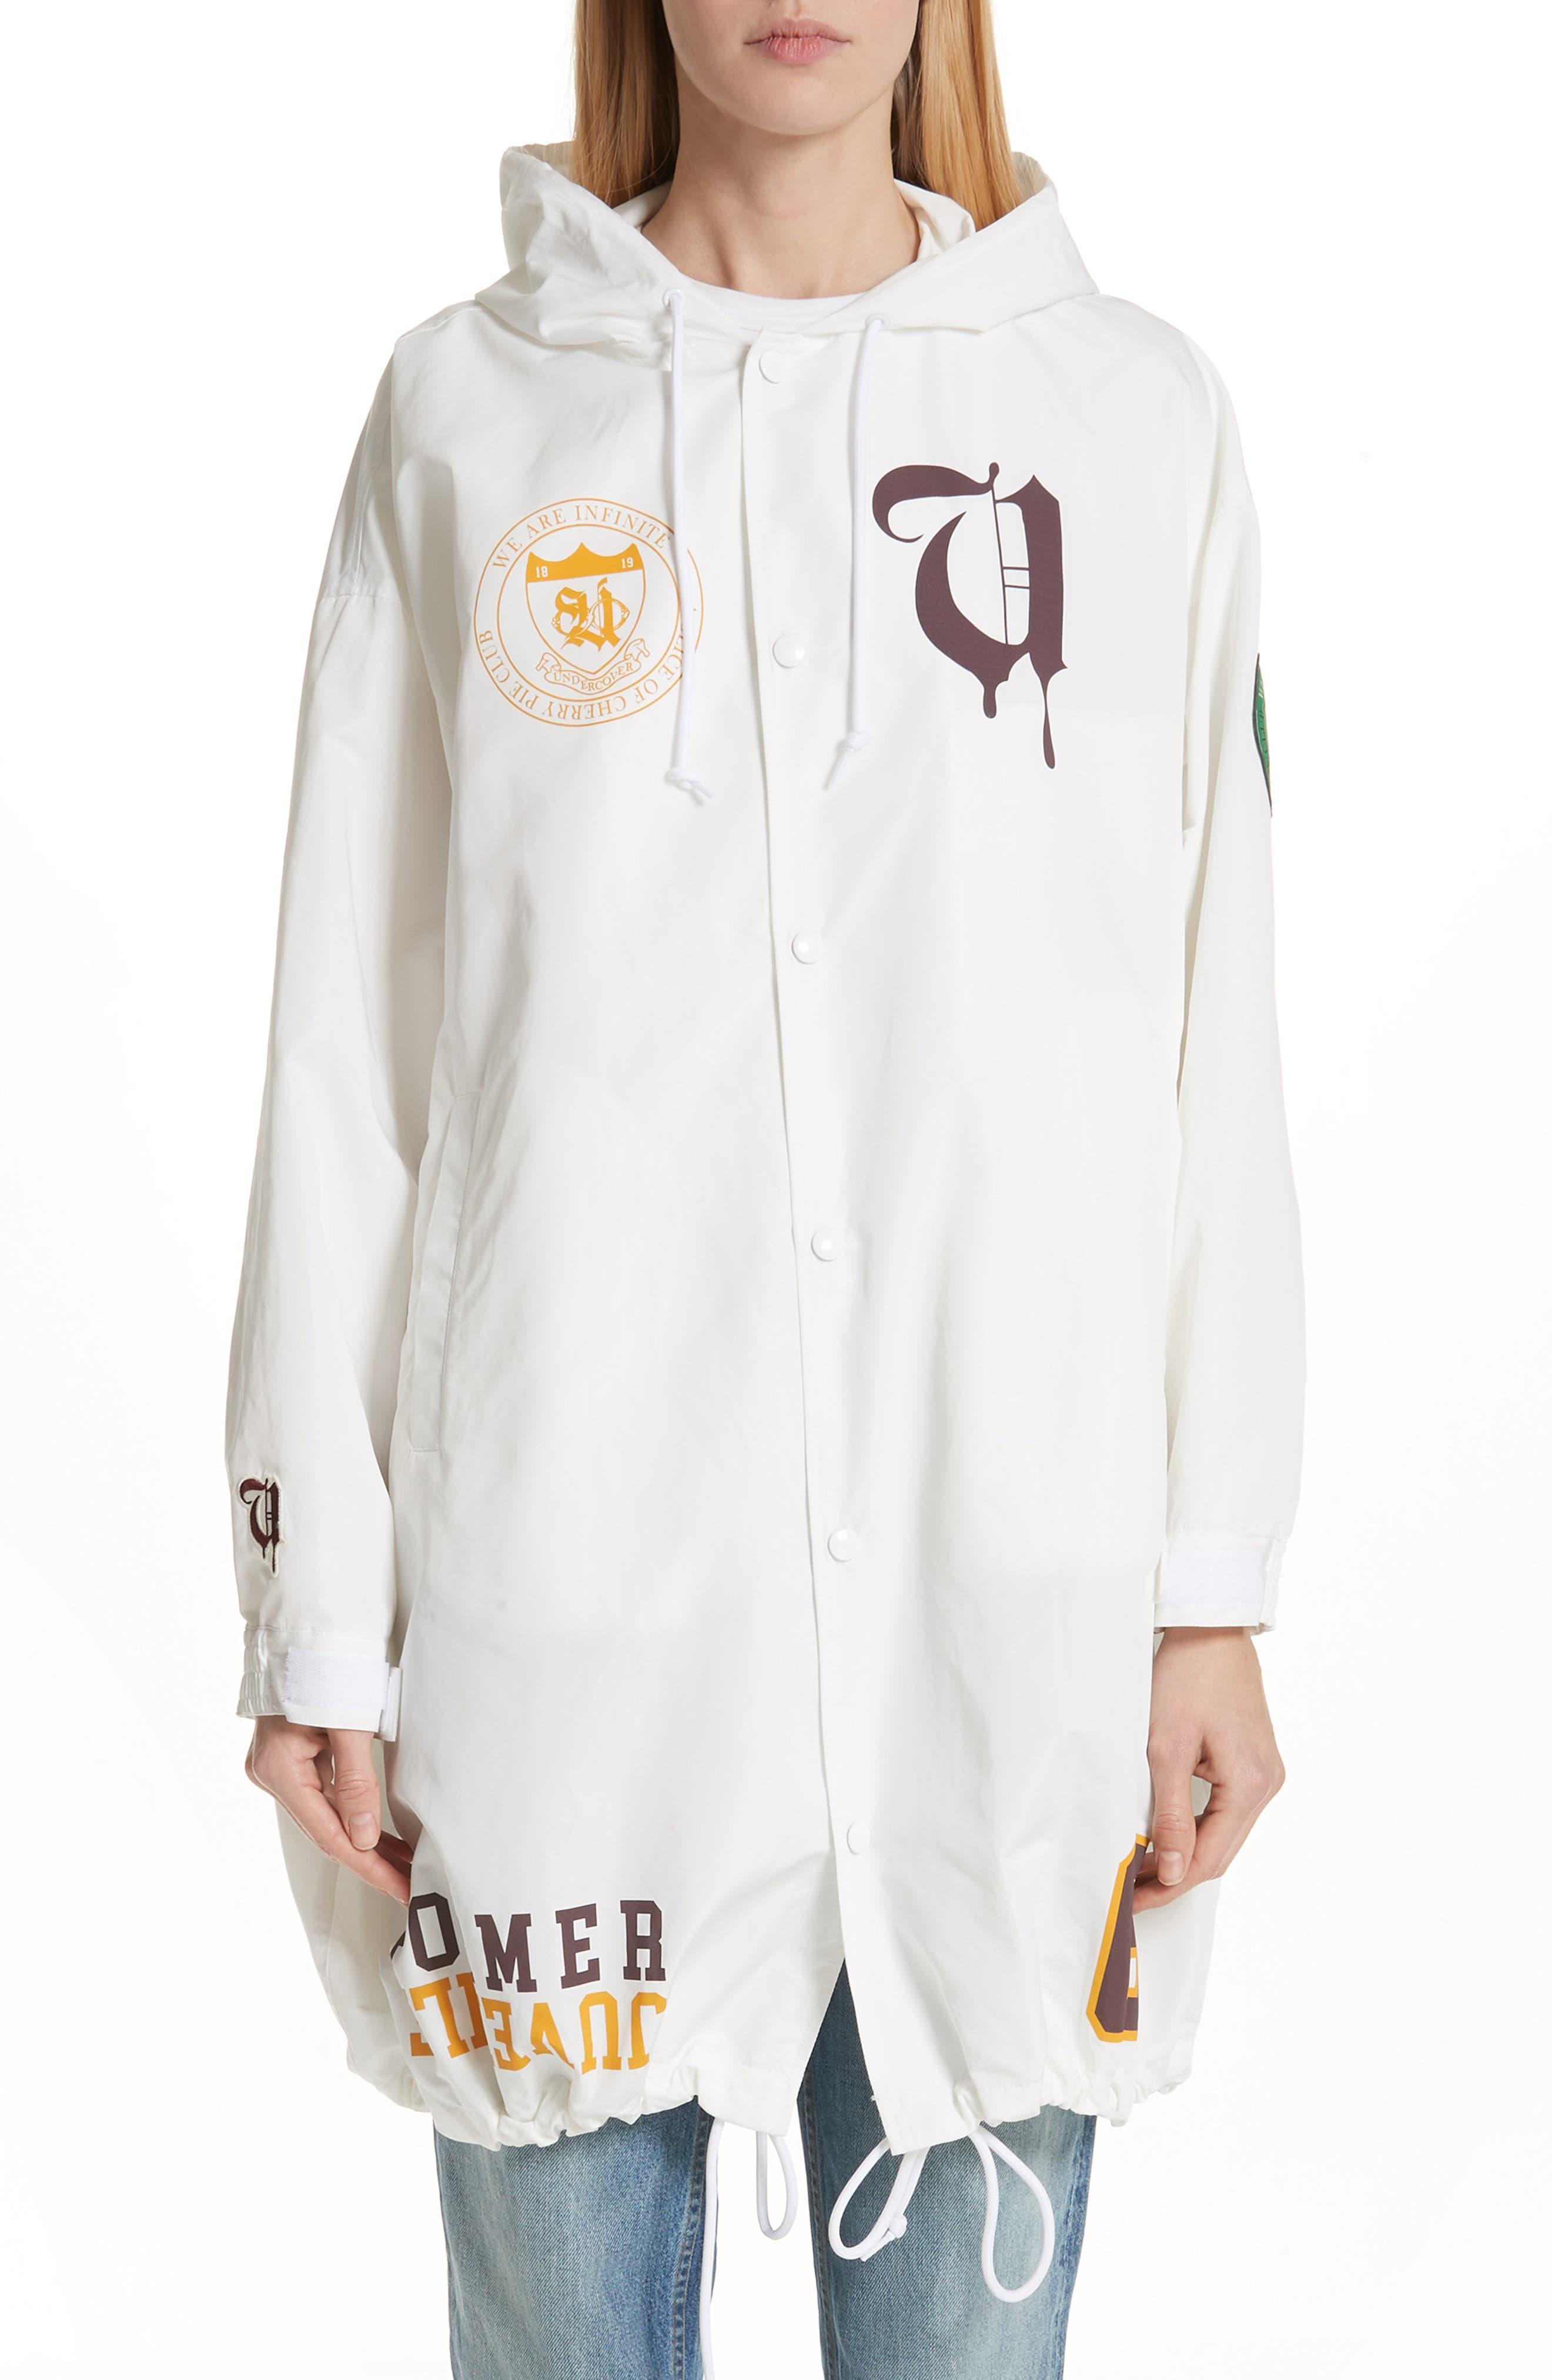 Former Juvenile Angel Jacket,                         Main,                         color, A WHITE